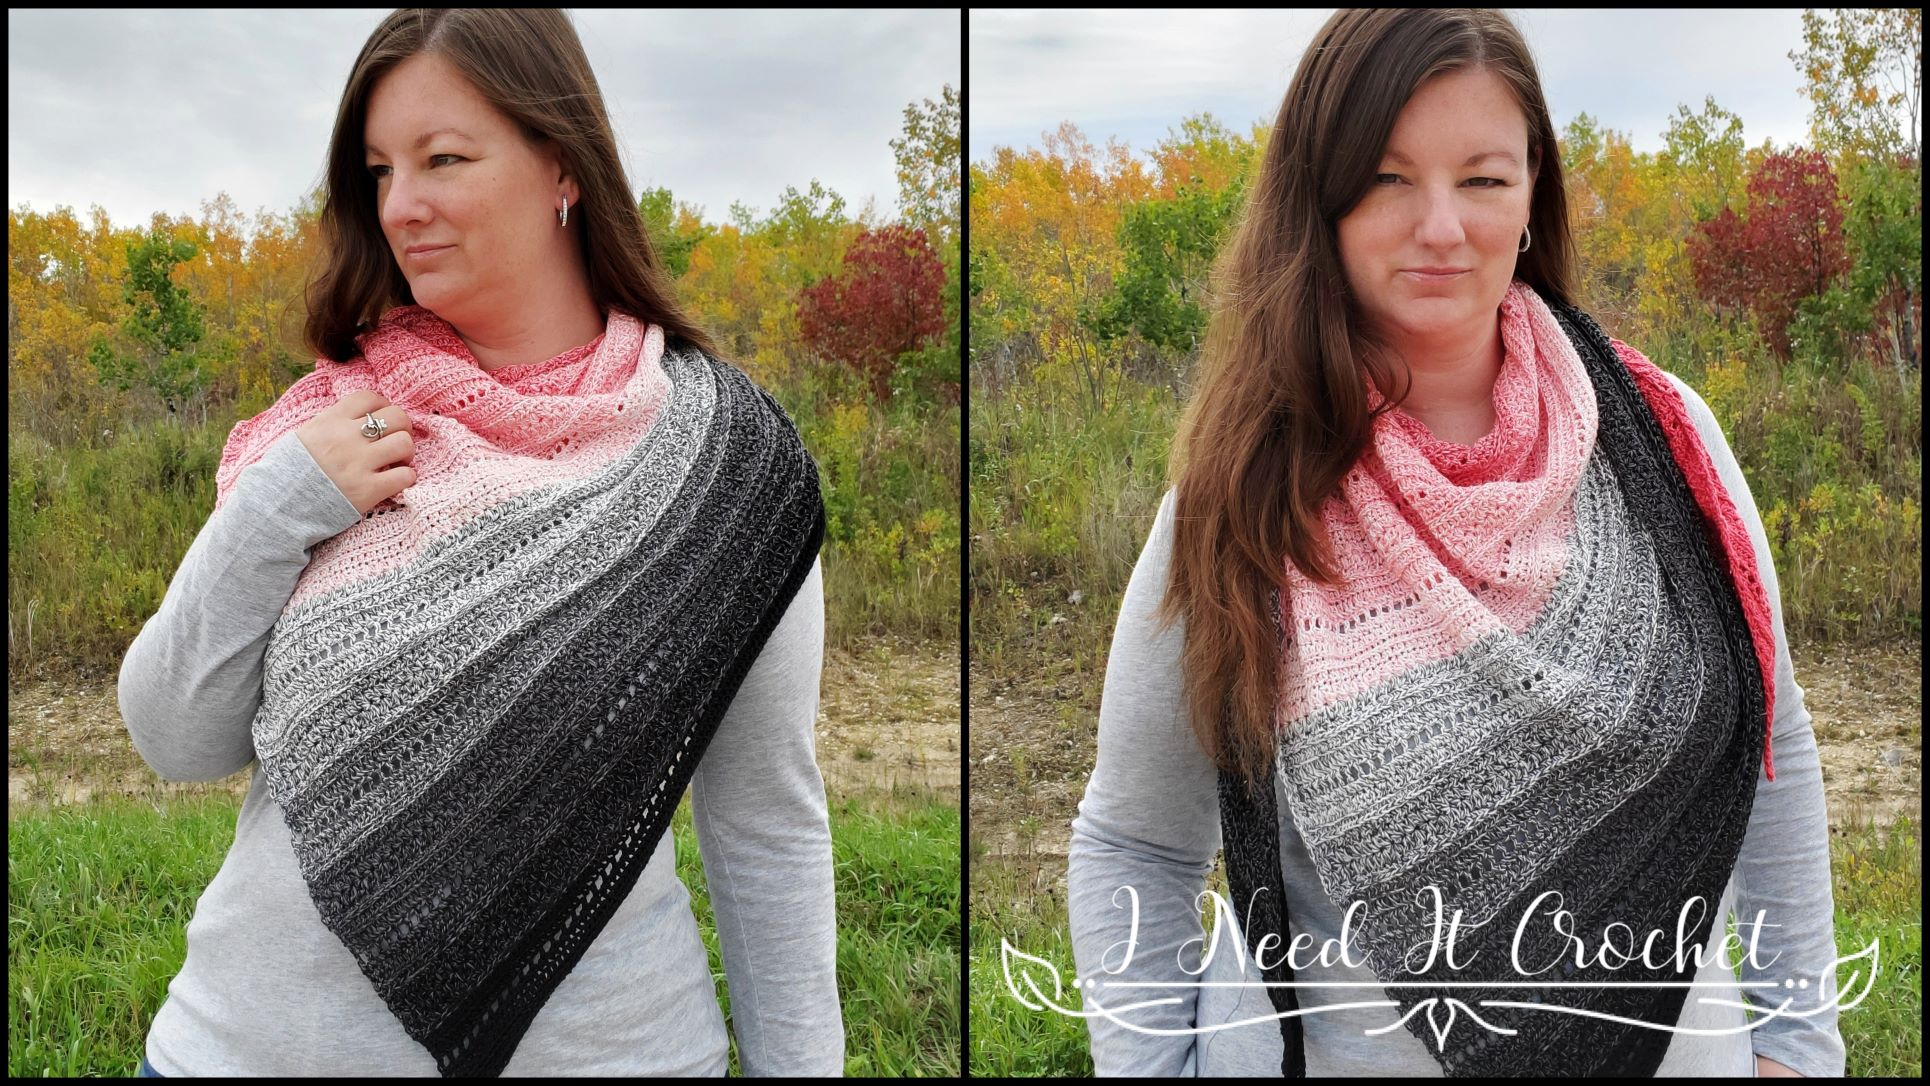 Effortless Shawl - Free Crochet Shawl Pattern